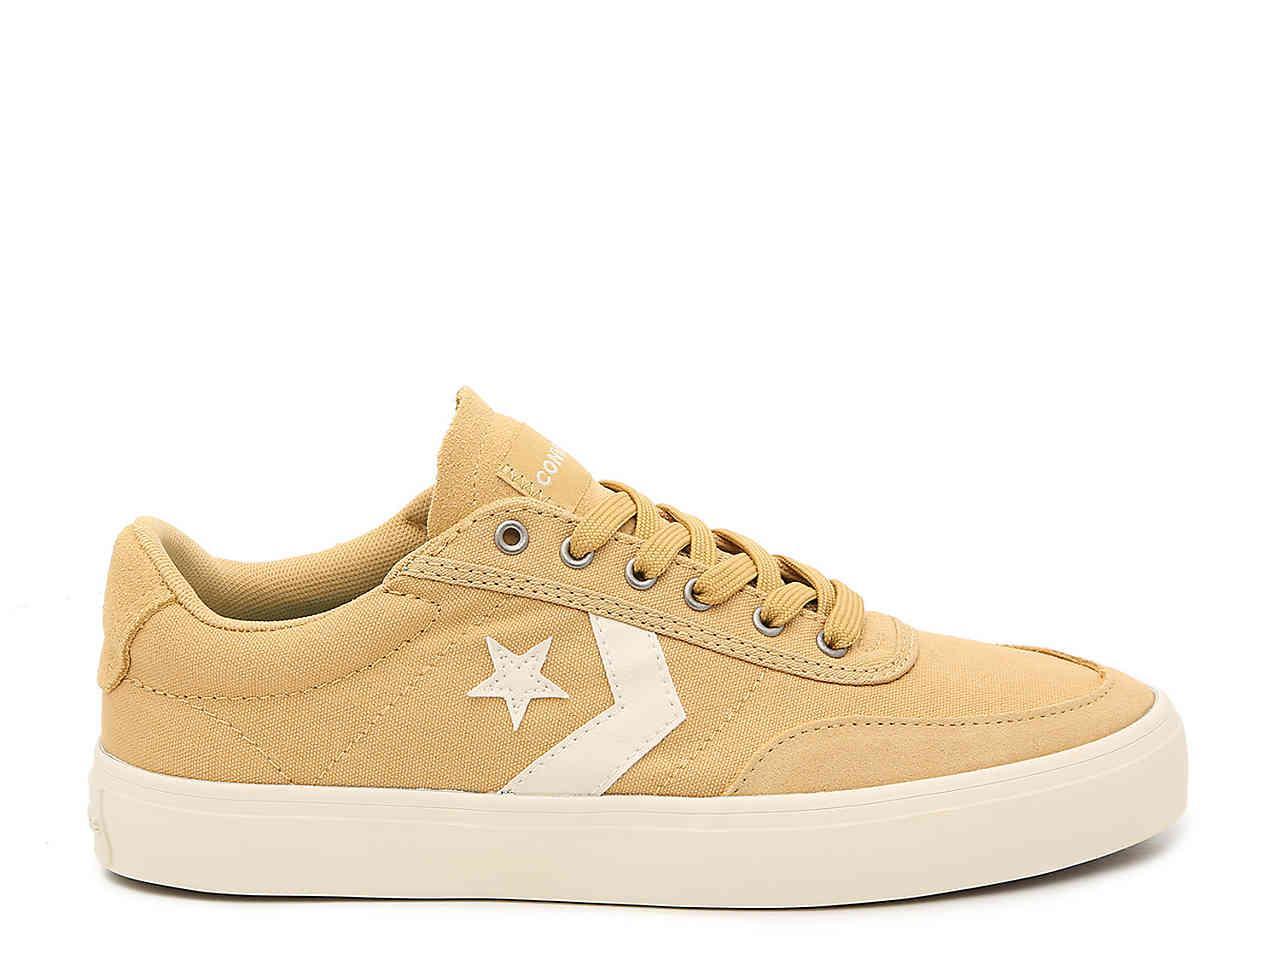 Converse Canvas Courtland Sneaker in